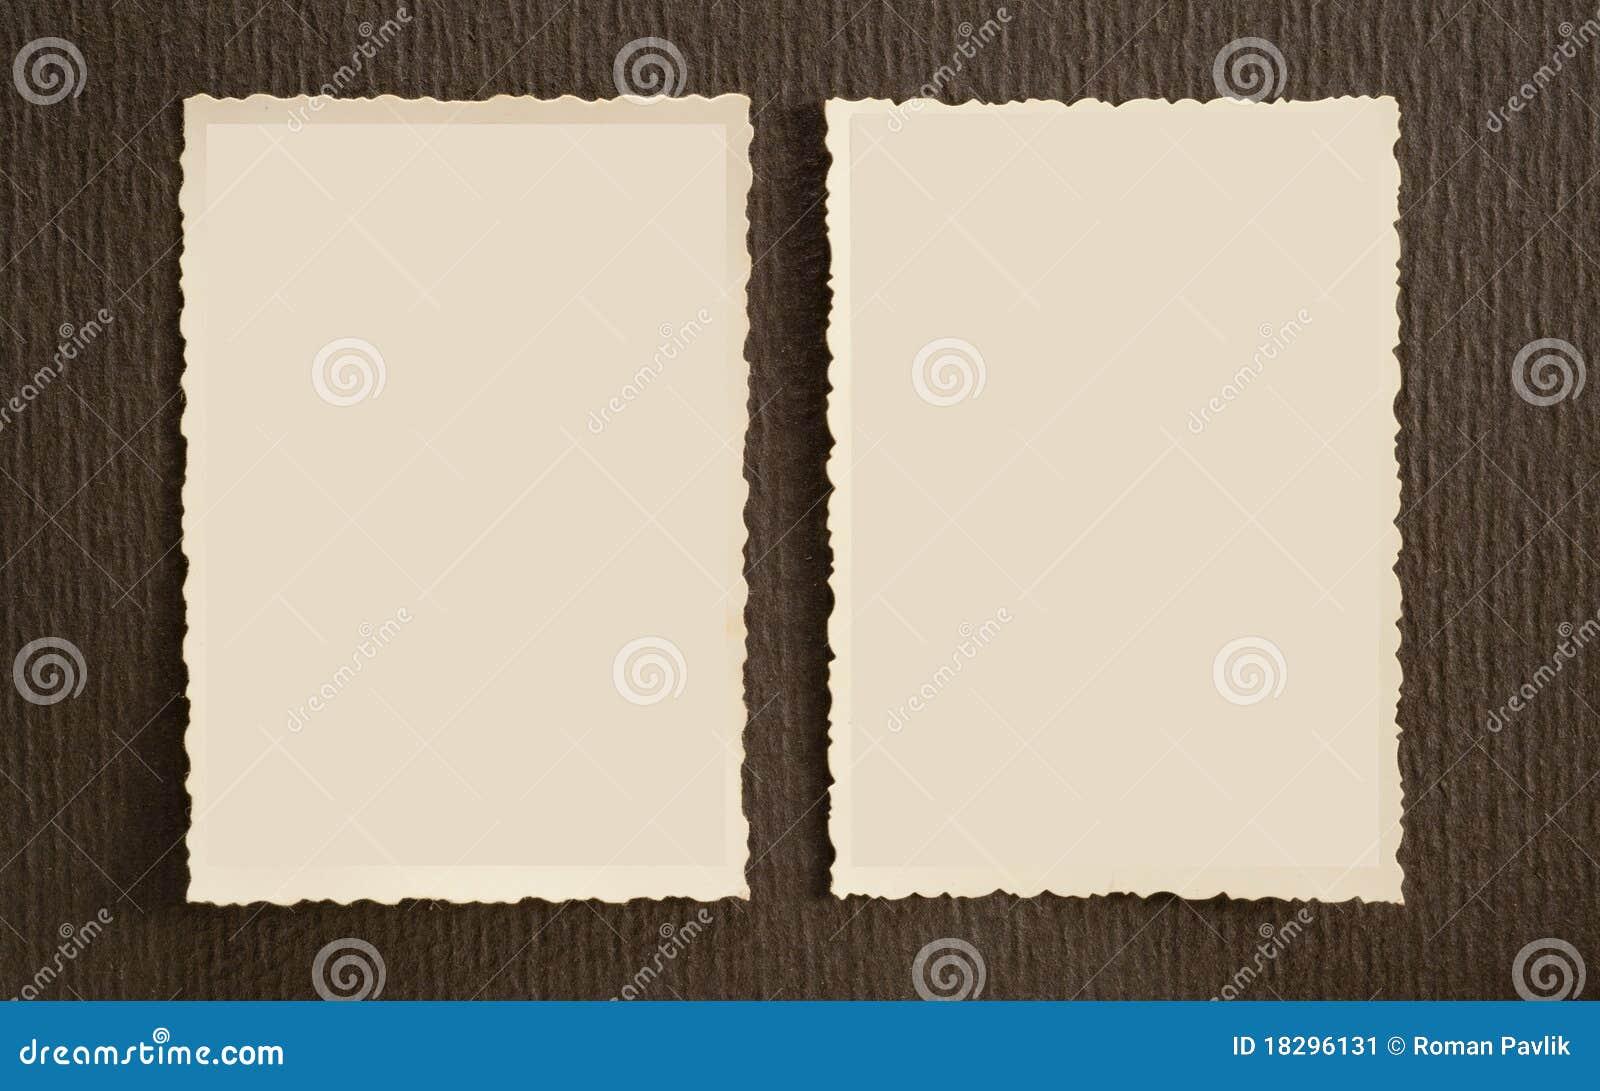 Old Photo Frames Stock Image Image Of Black Paper Edge